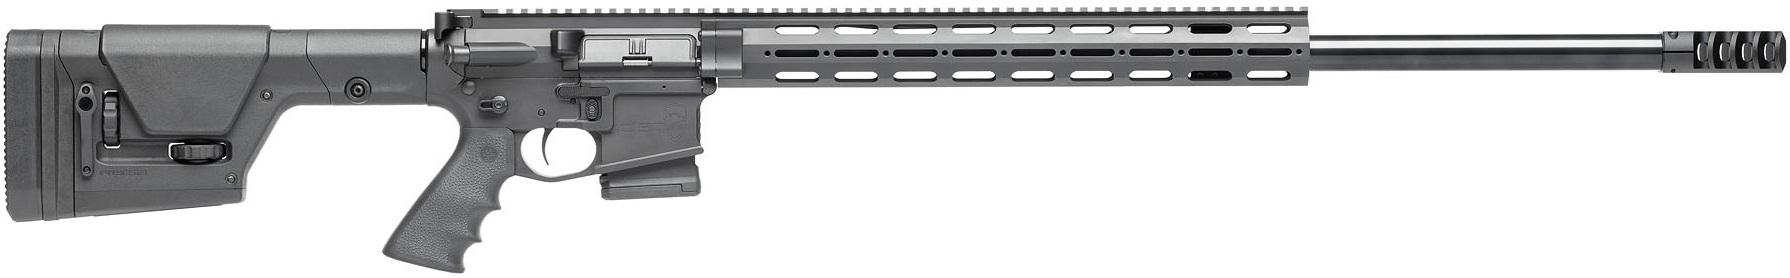 DAR-15 LRS